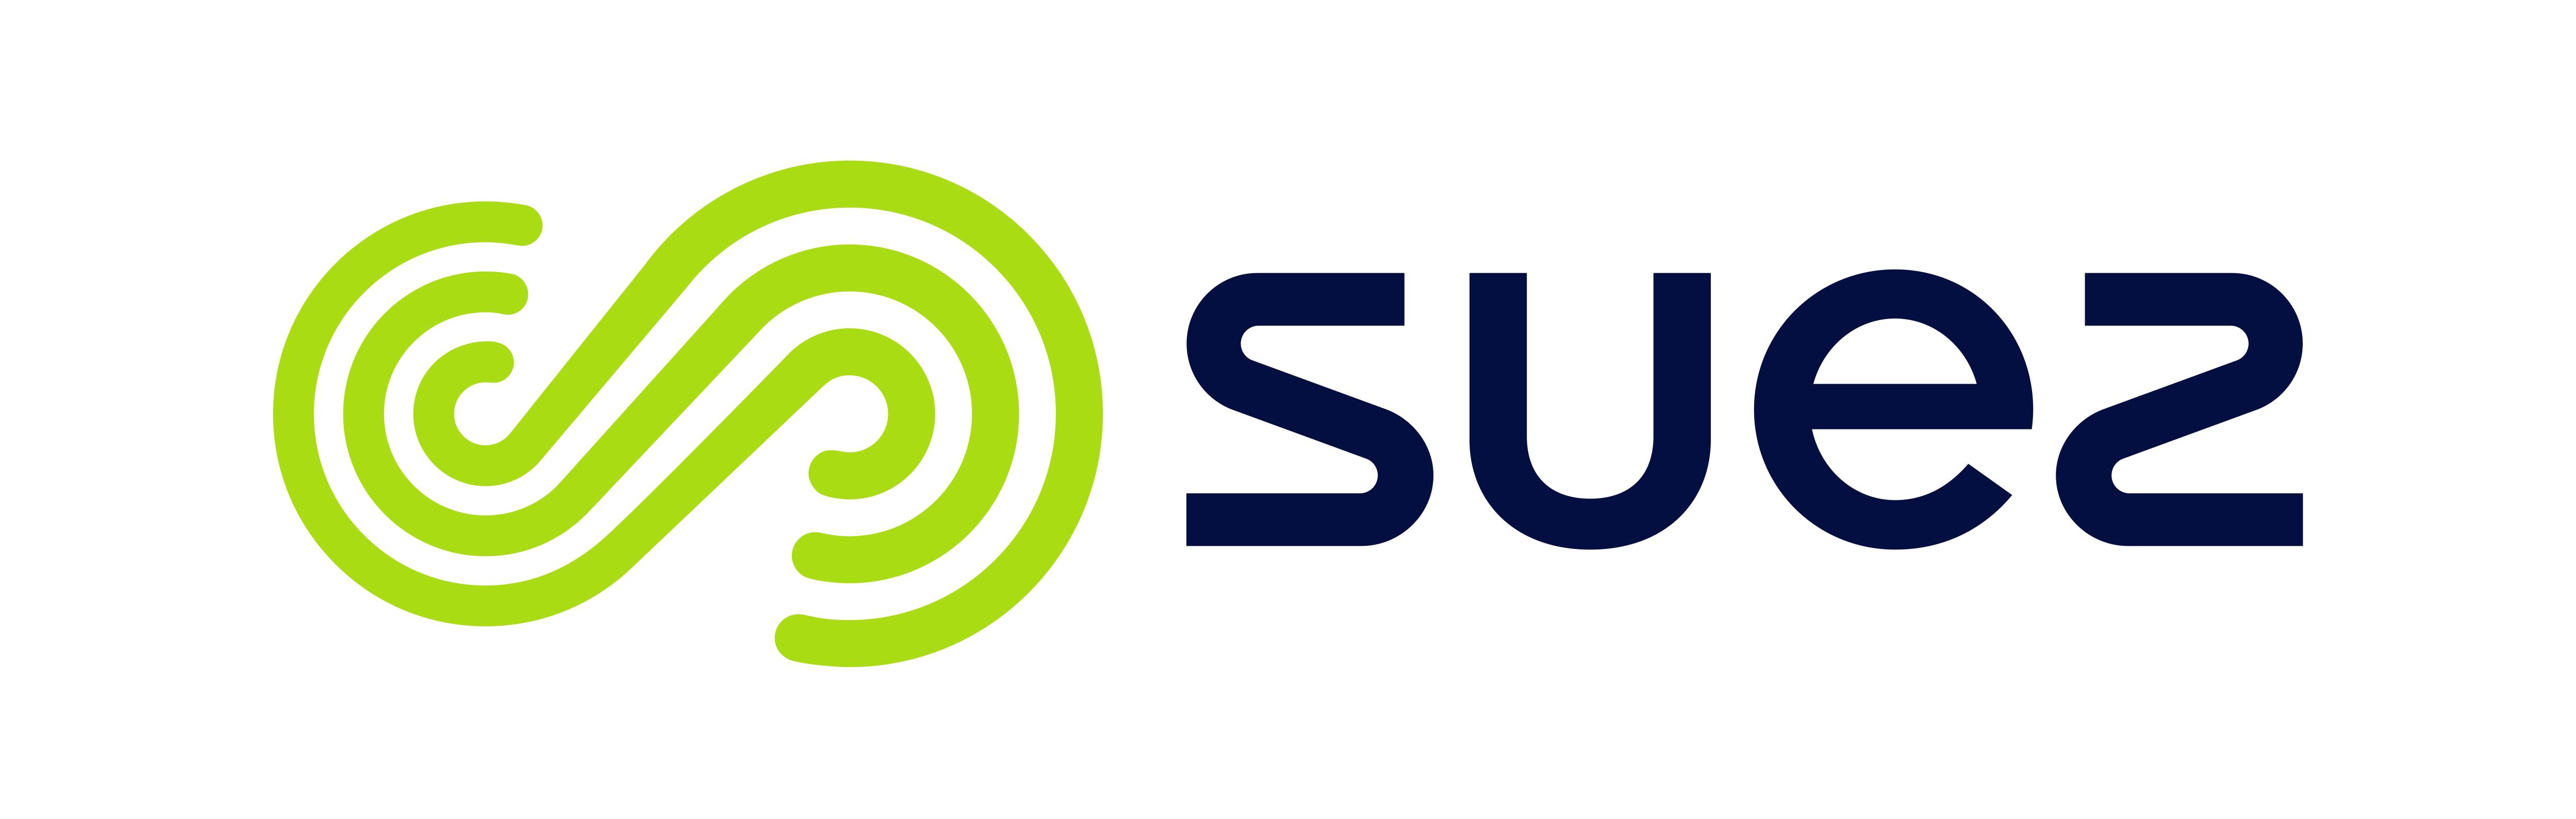 SUEZ_NEW logo